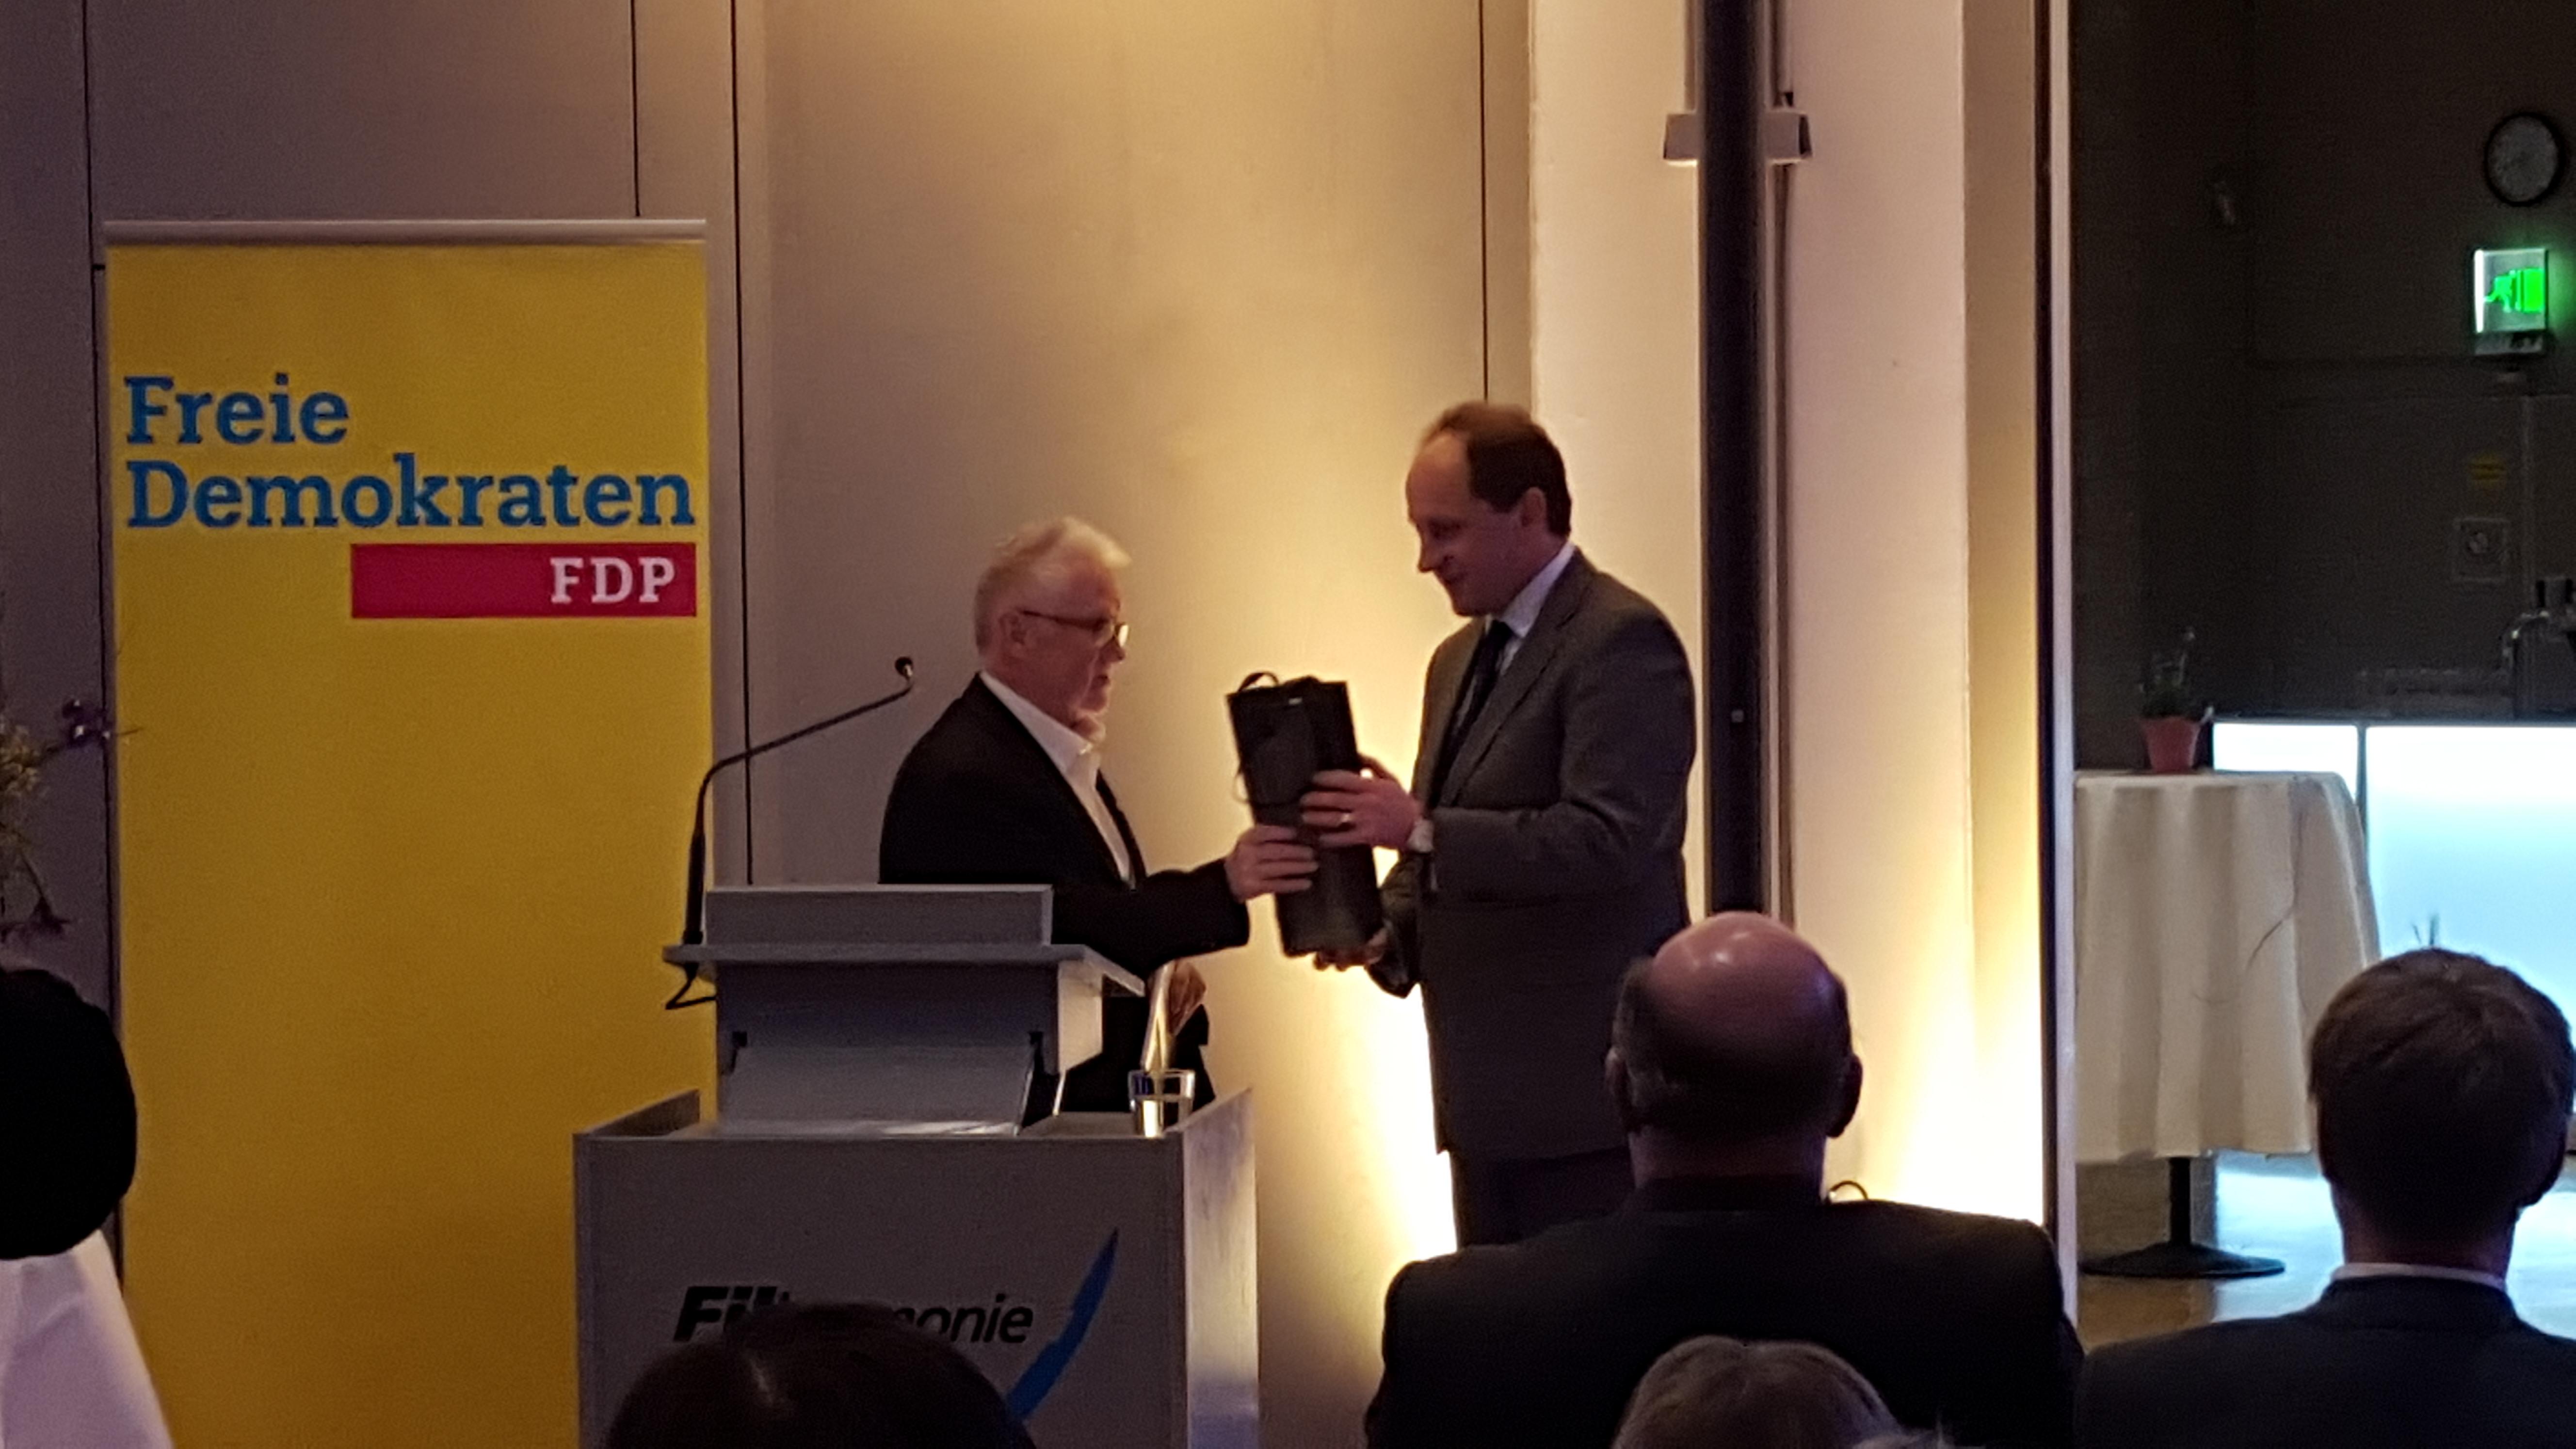 links: Johannes Jauch, Vorsitzender Freie Demokraten Filderstadt rechts: Alexander Graf Lambsdorff, Vizepräsident des Europäischen Parlaments